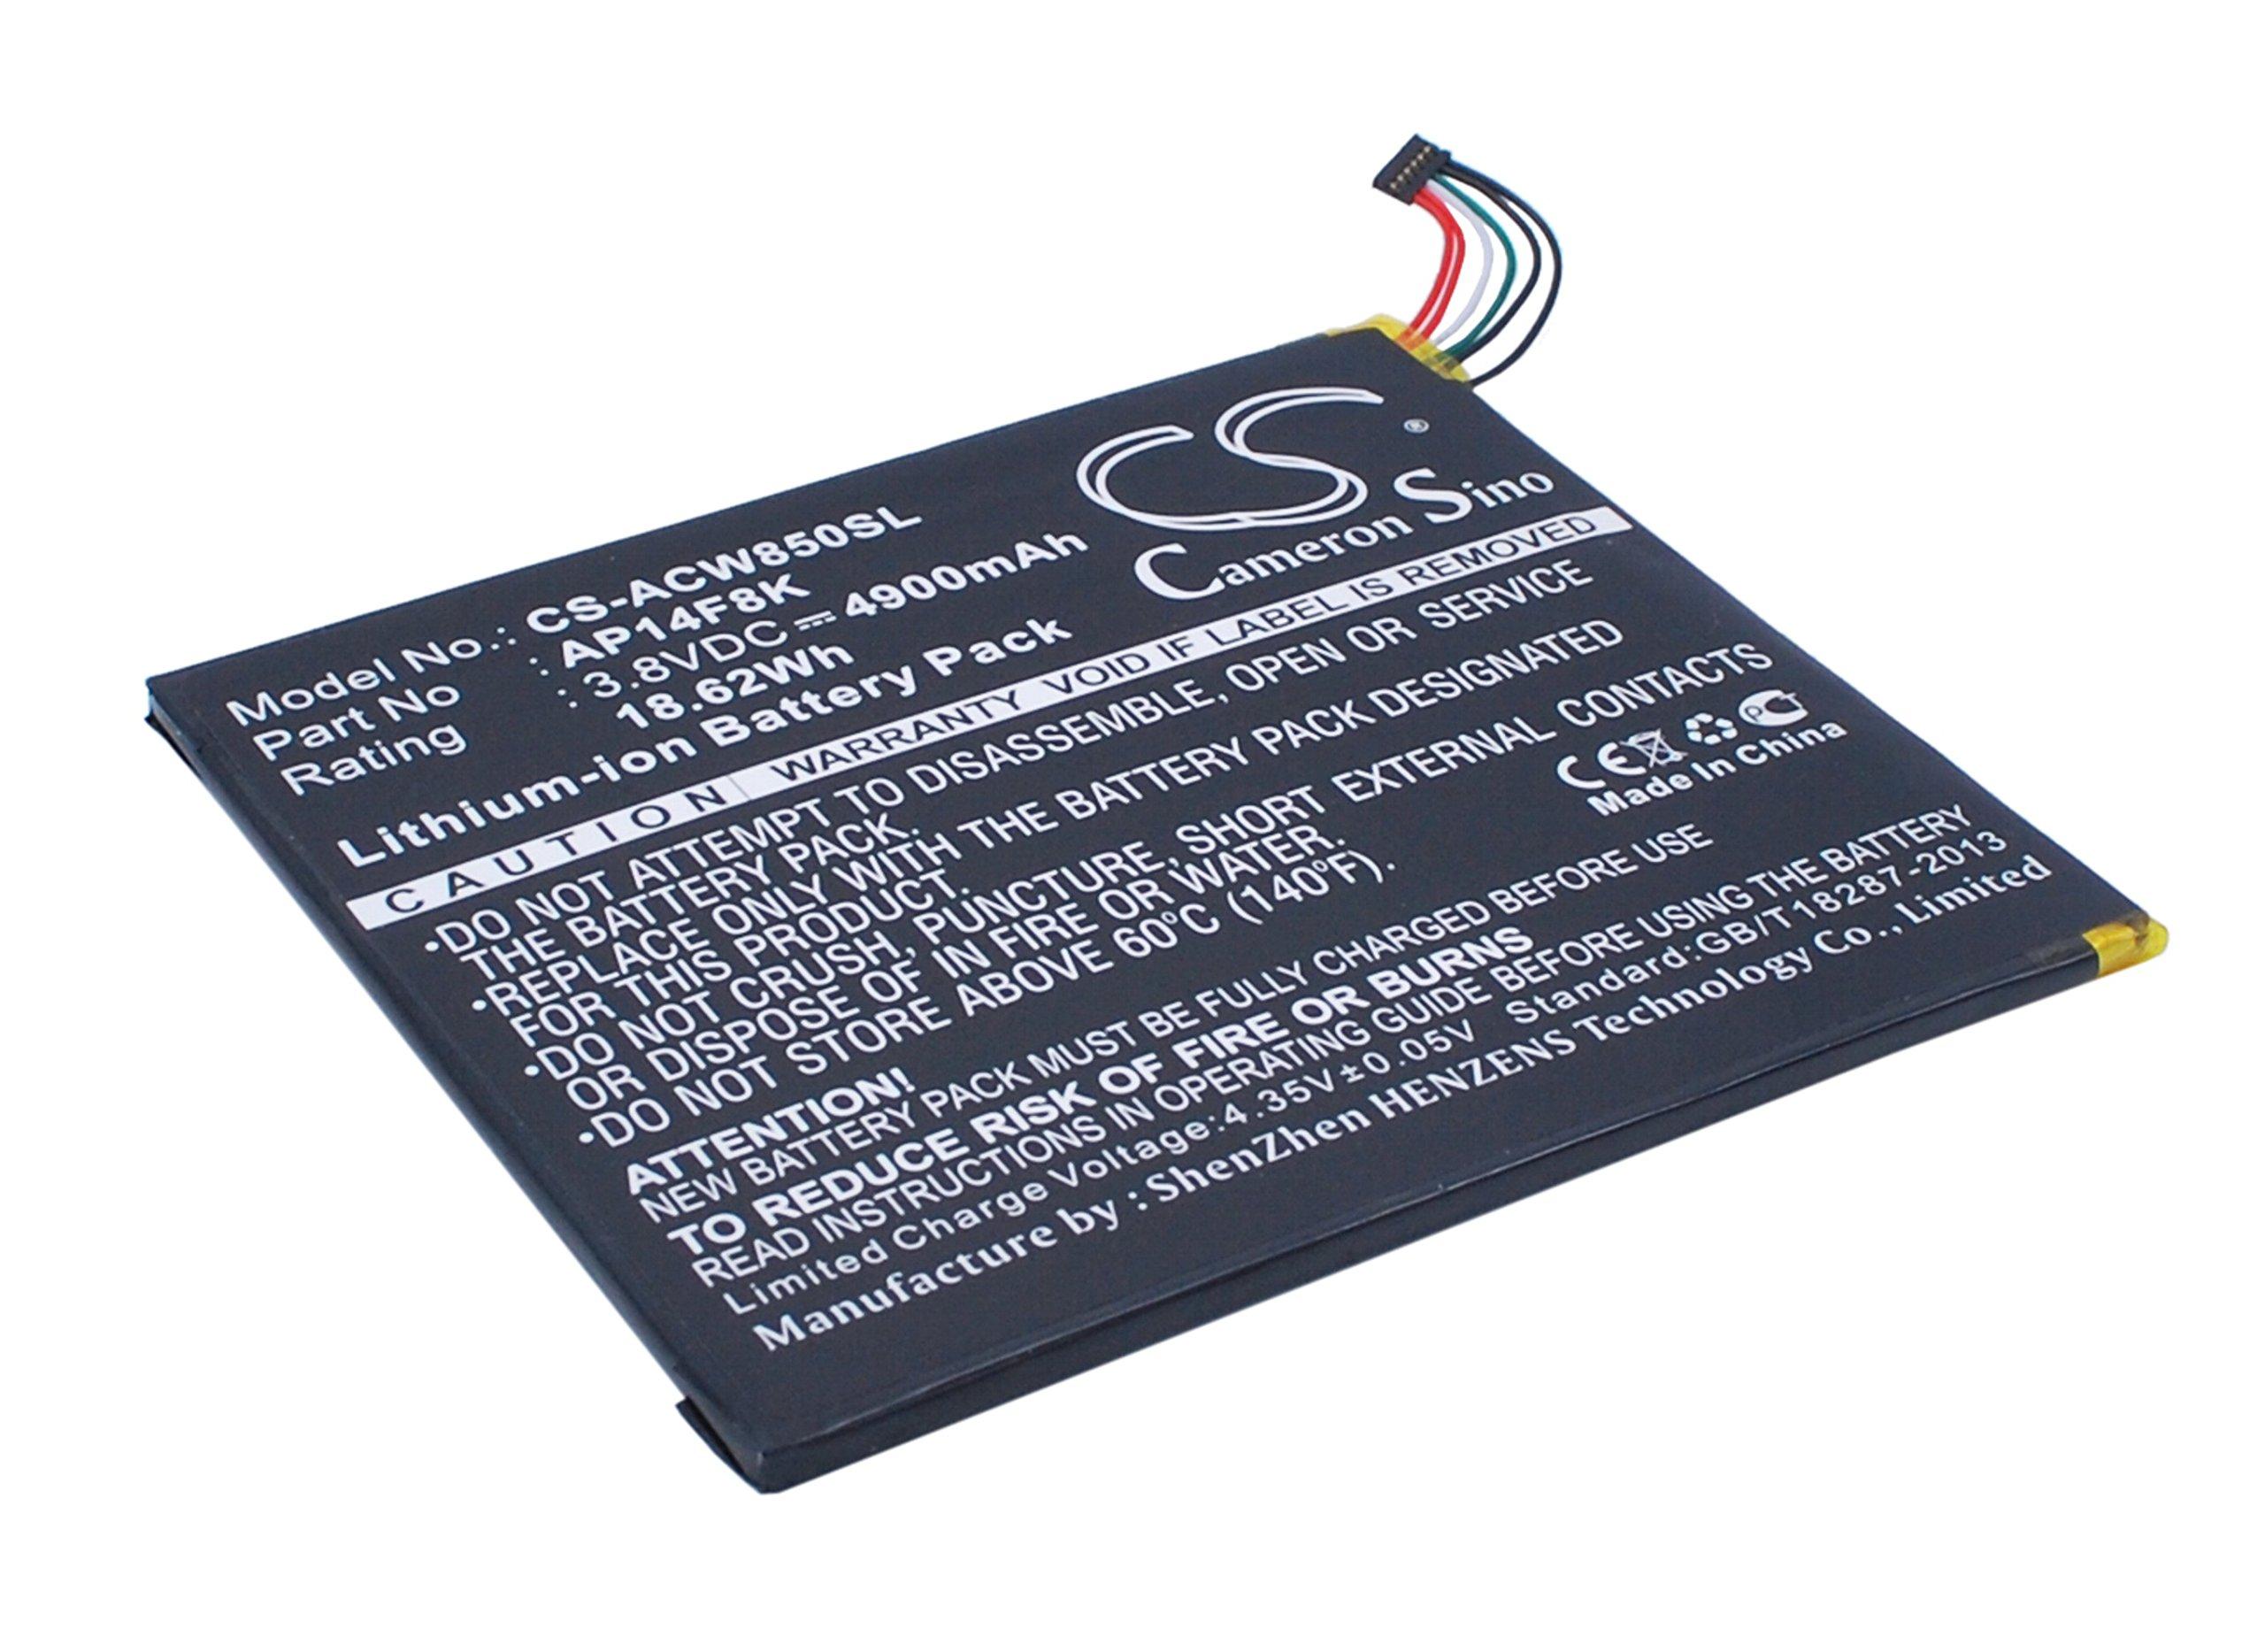 4900mAh X-Longer Tablet Battery for Acer A1-840, A1-850-A1410, A1-860 (AP14F8K, AP14F8K (1ICP4/101/110))